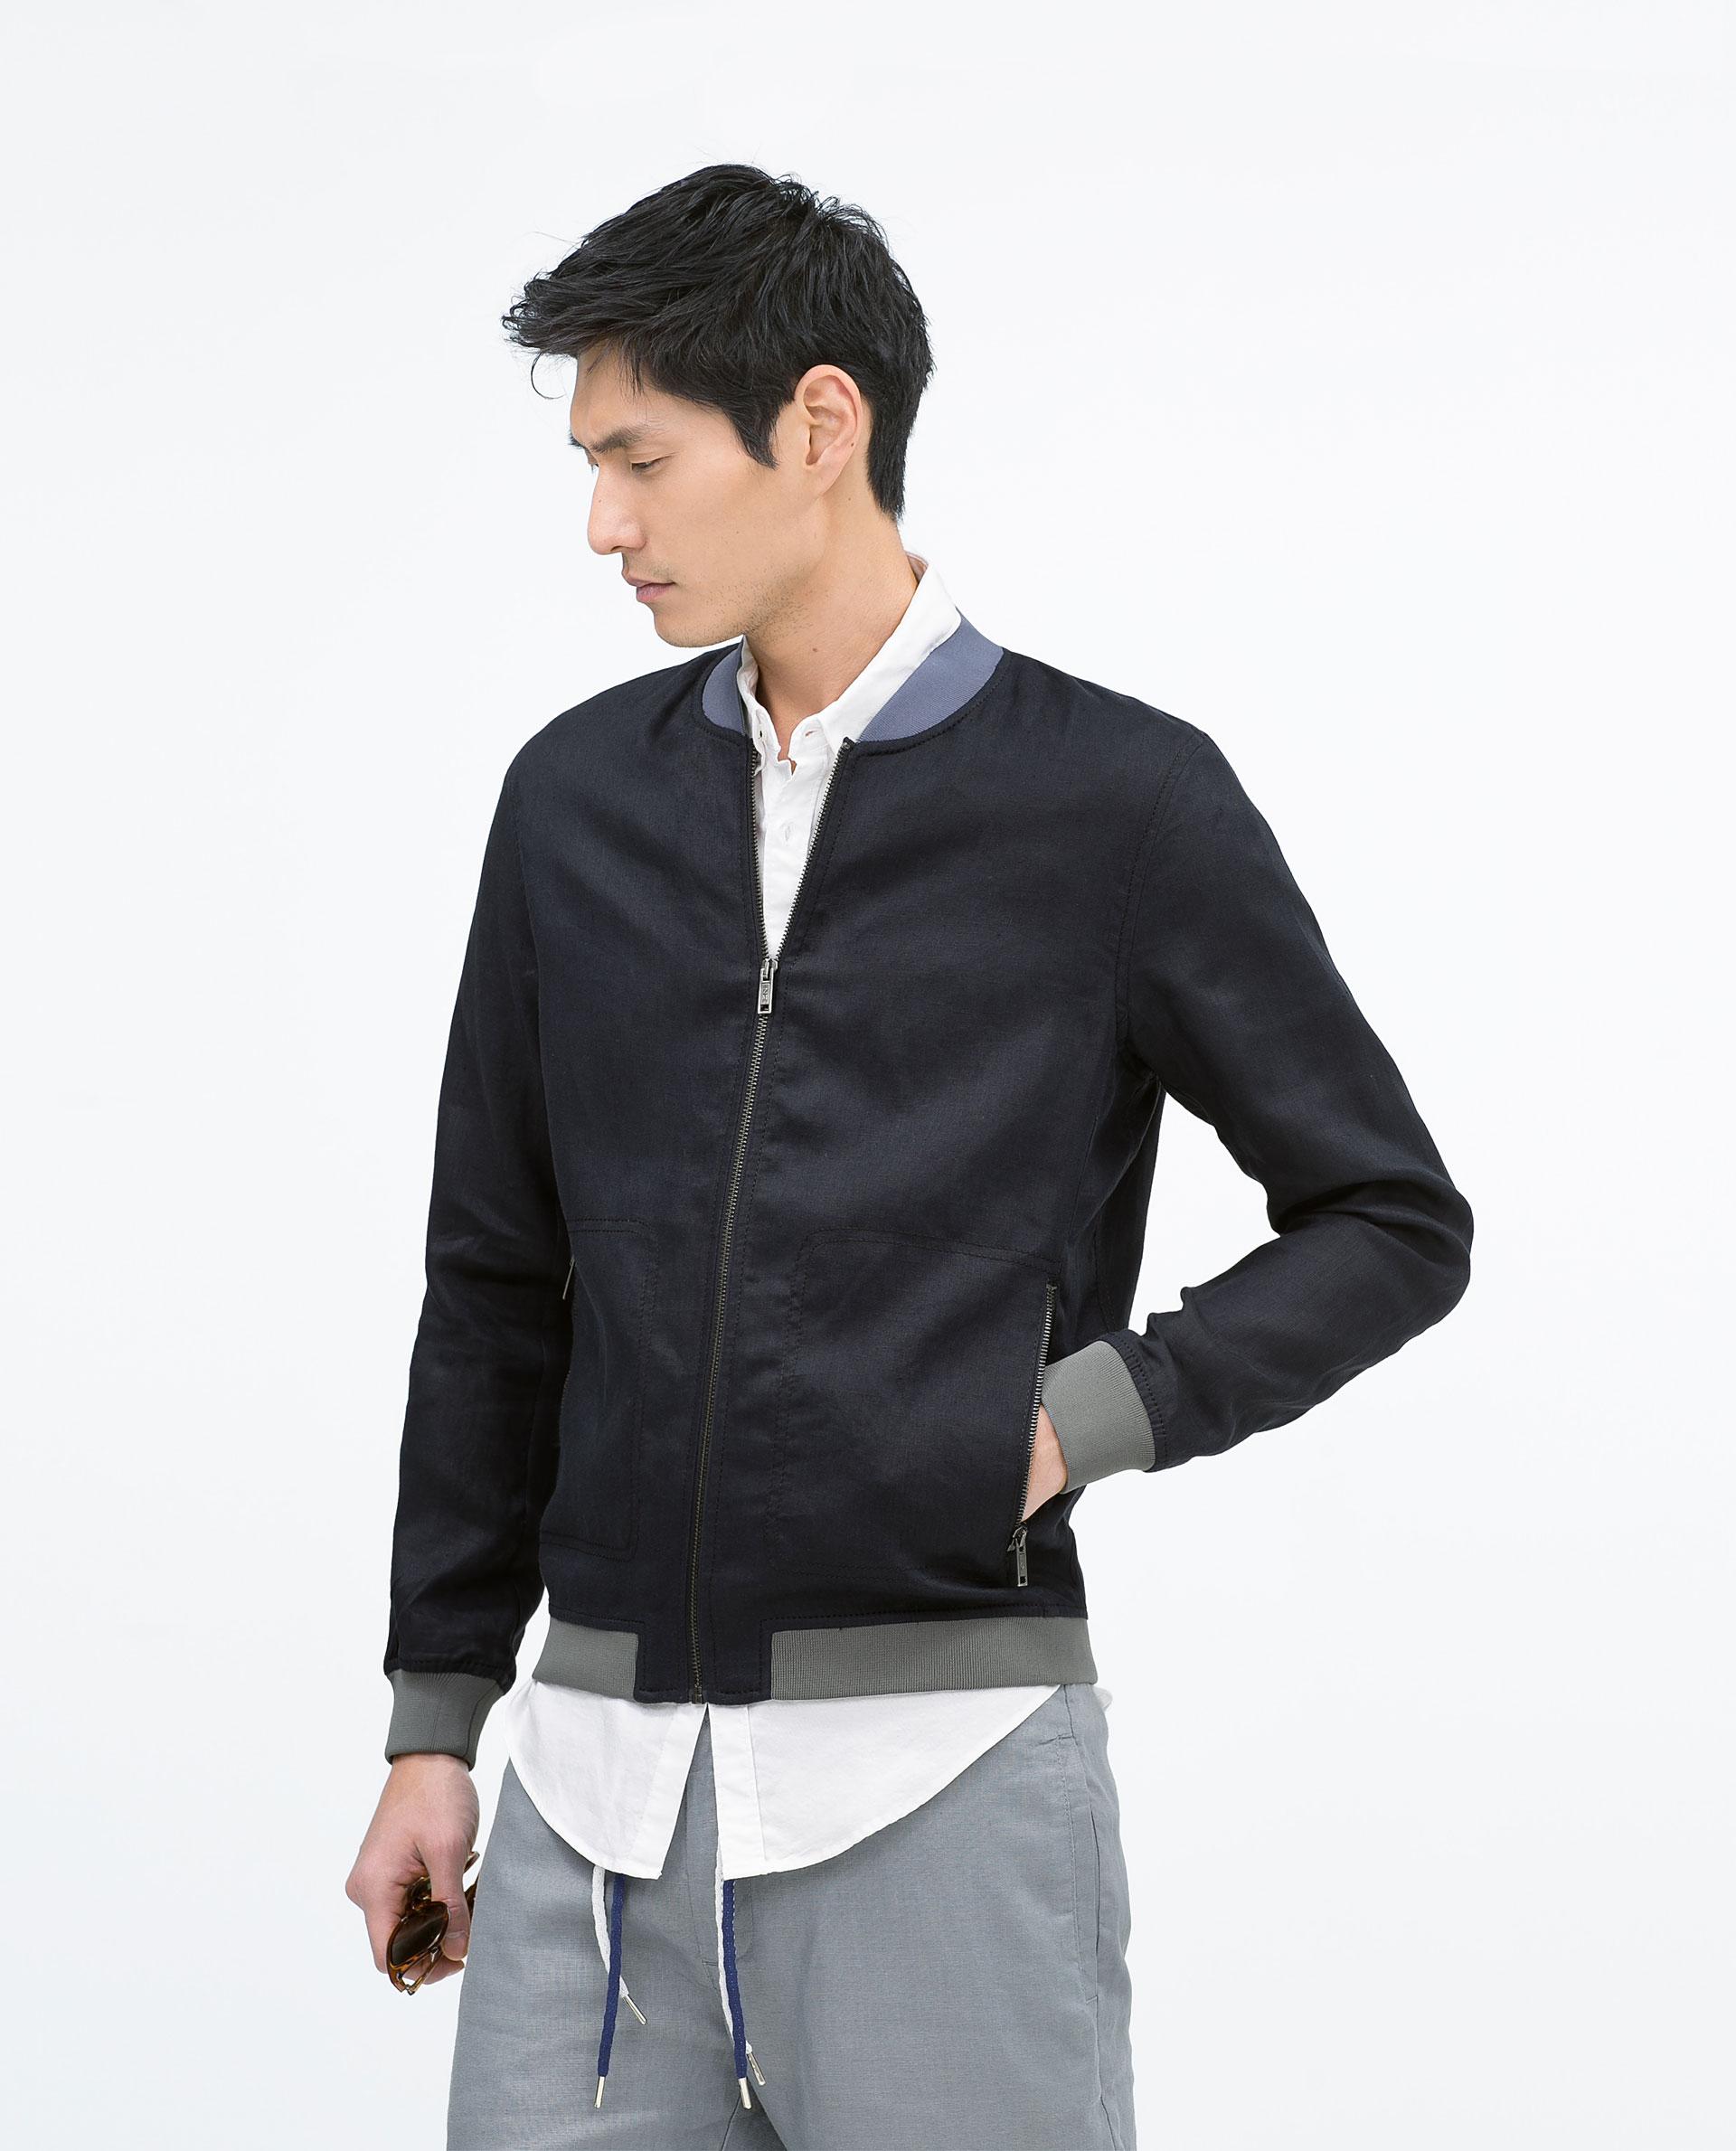 cheap moncler mens coats zara for sale rh newdevelopmentguide com